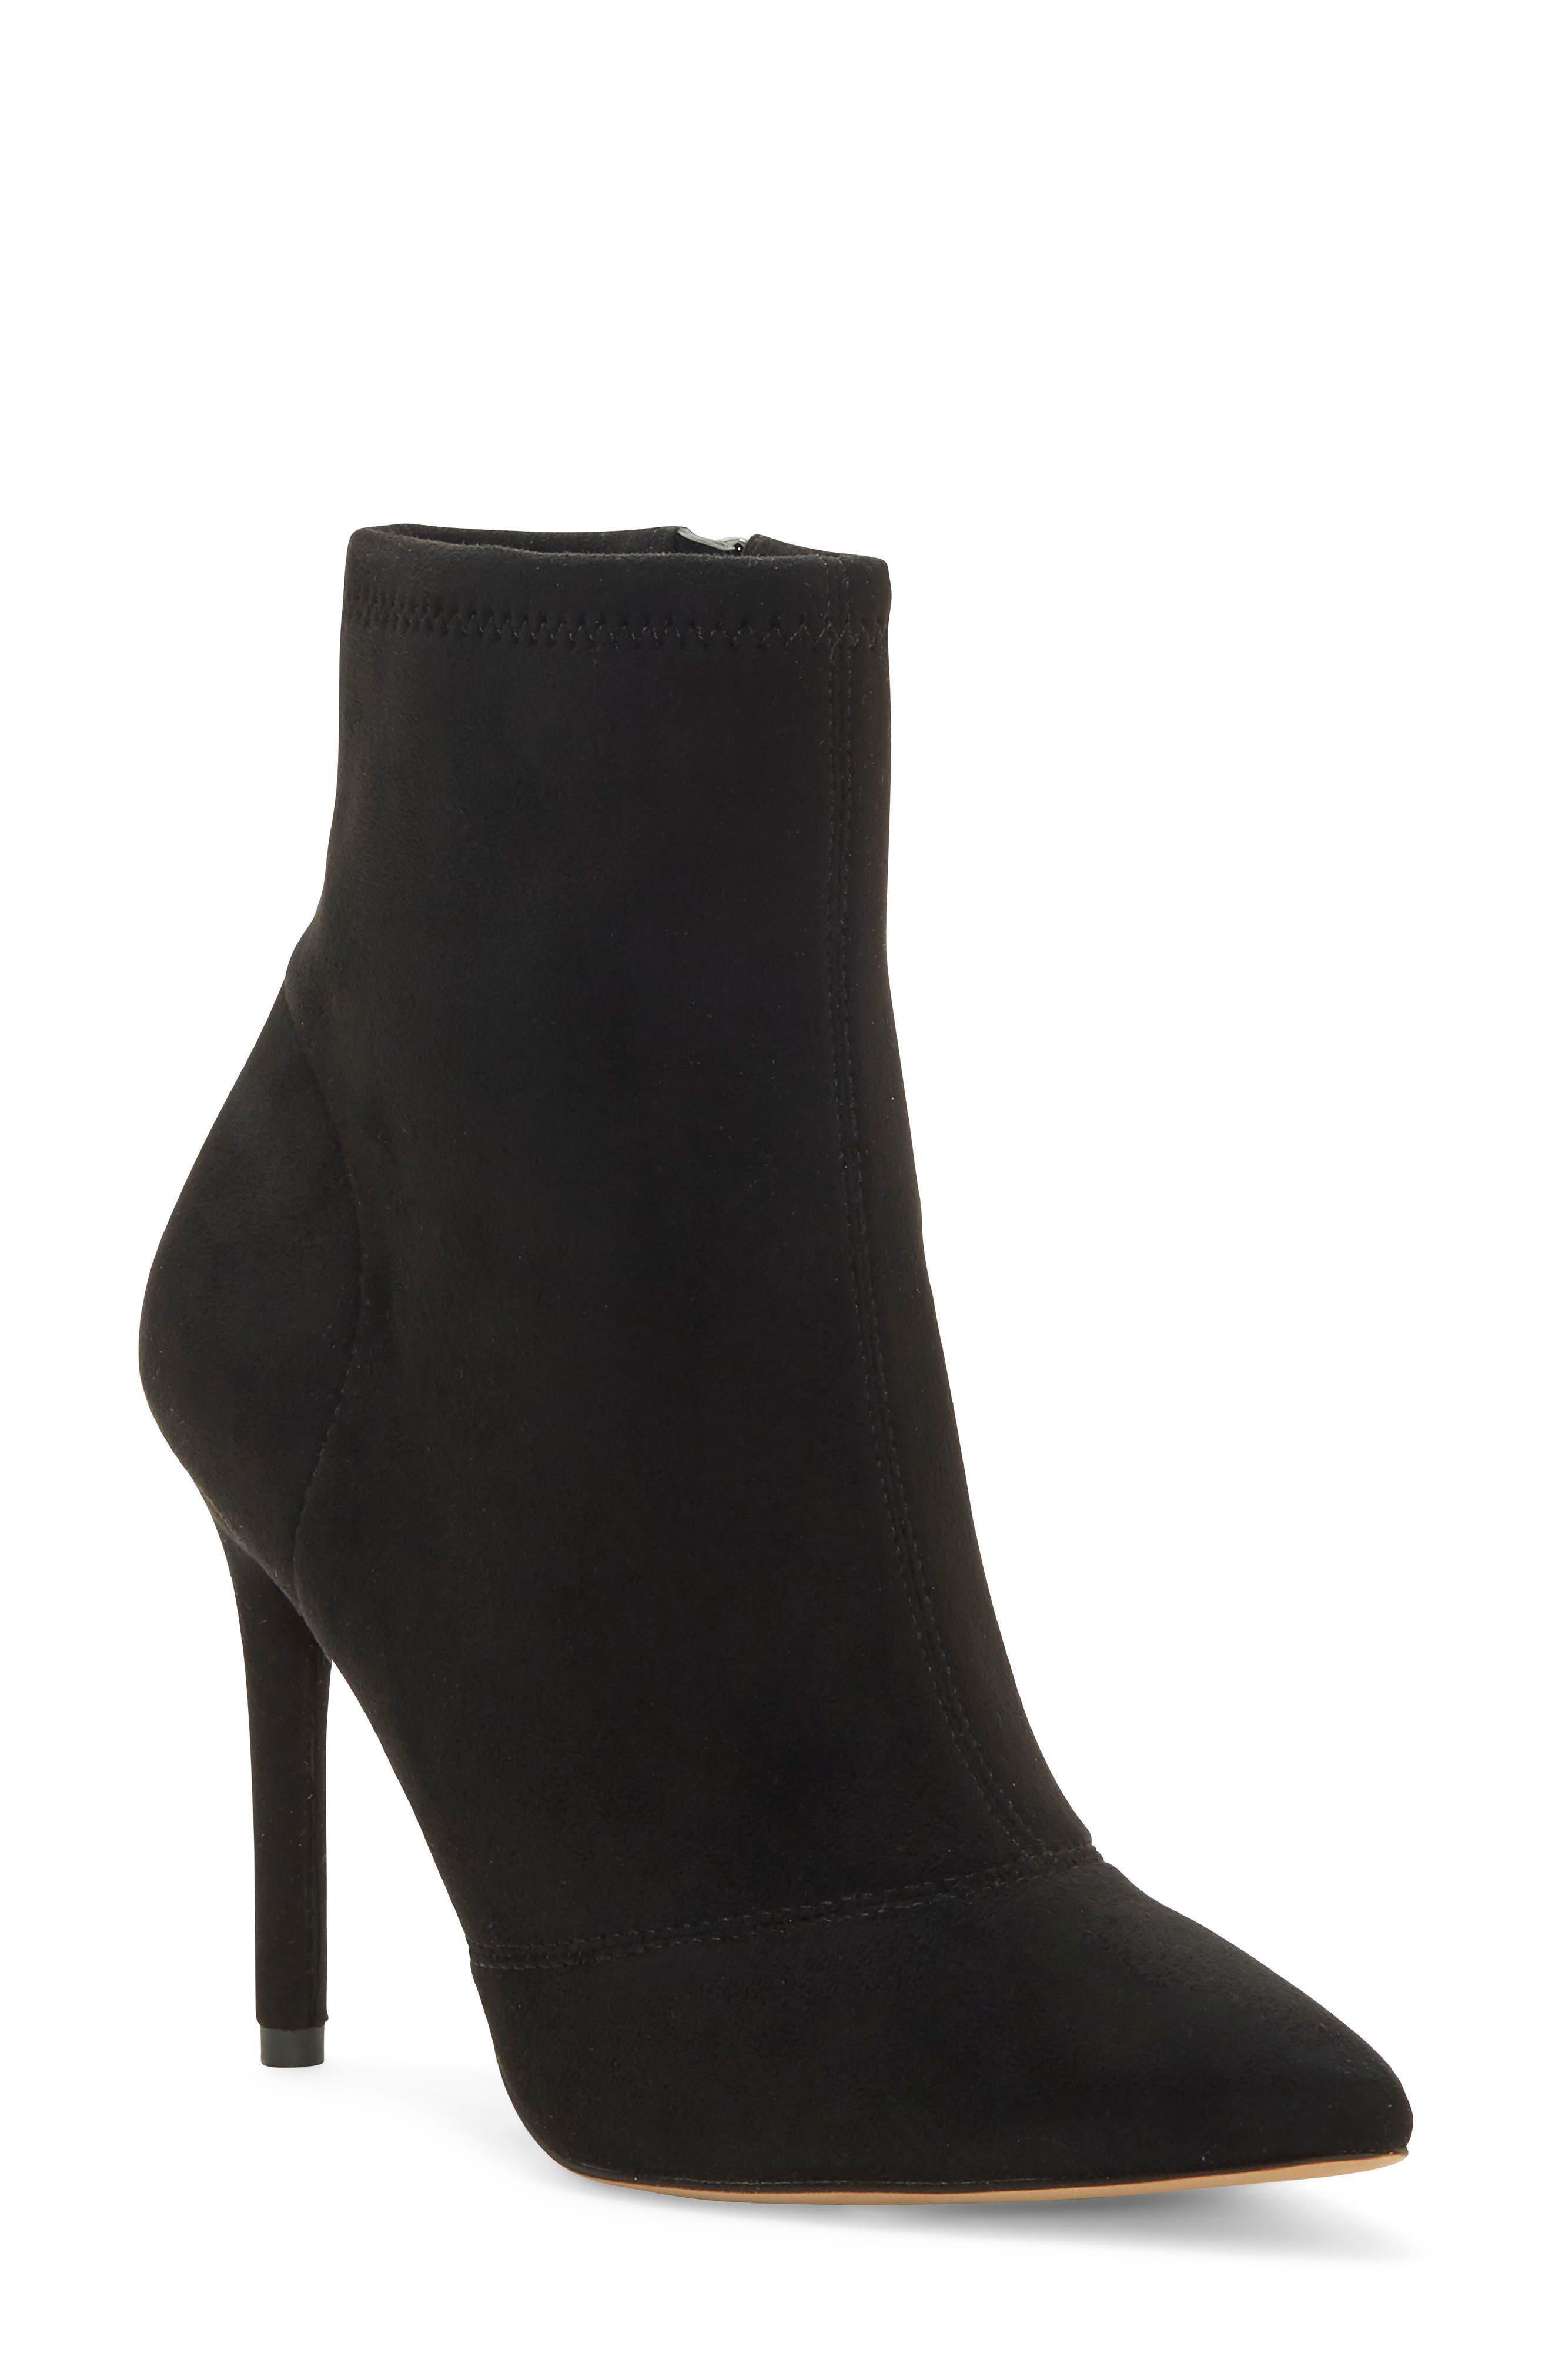 jessica simpson lailee glitter stiletto boots